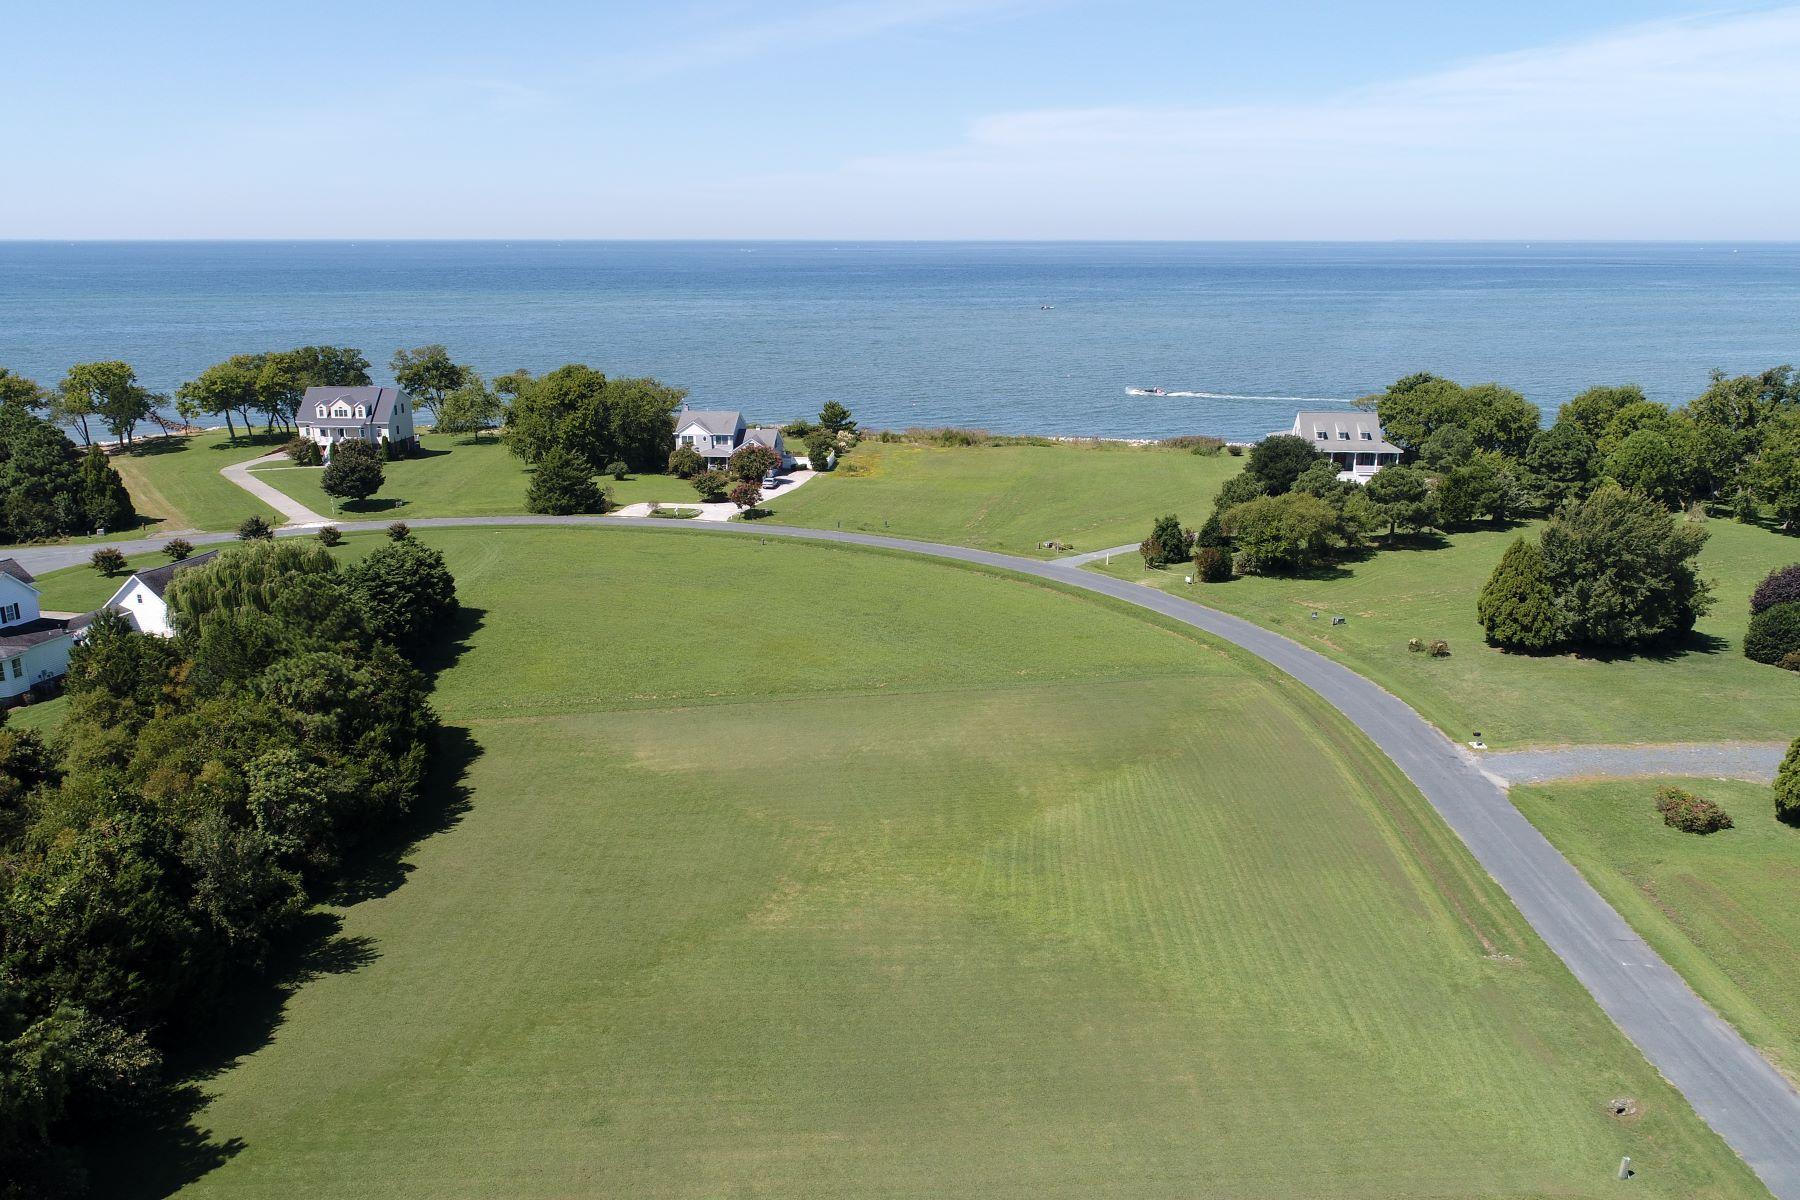 Land for Sale at Arlington Plantation LOT 40 ARLINGTON CHASE, Cape Charles, Virginia 23310 United States